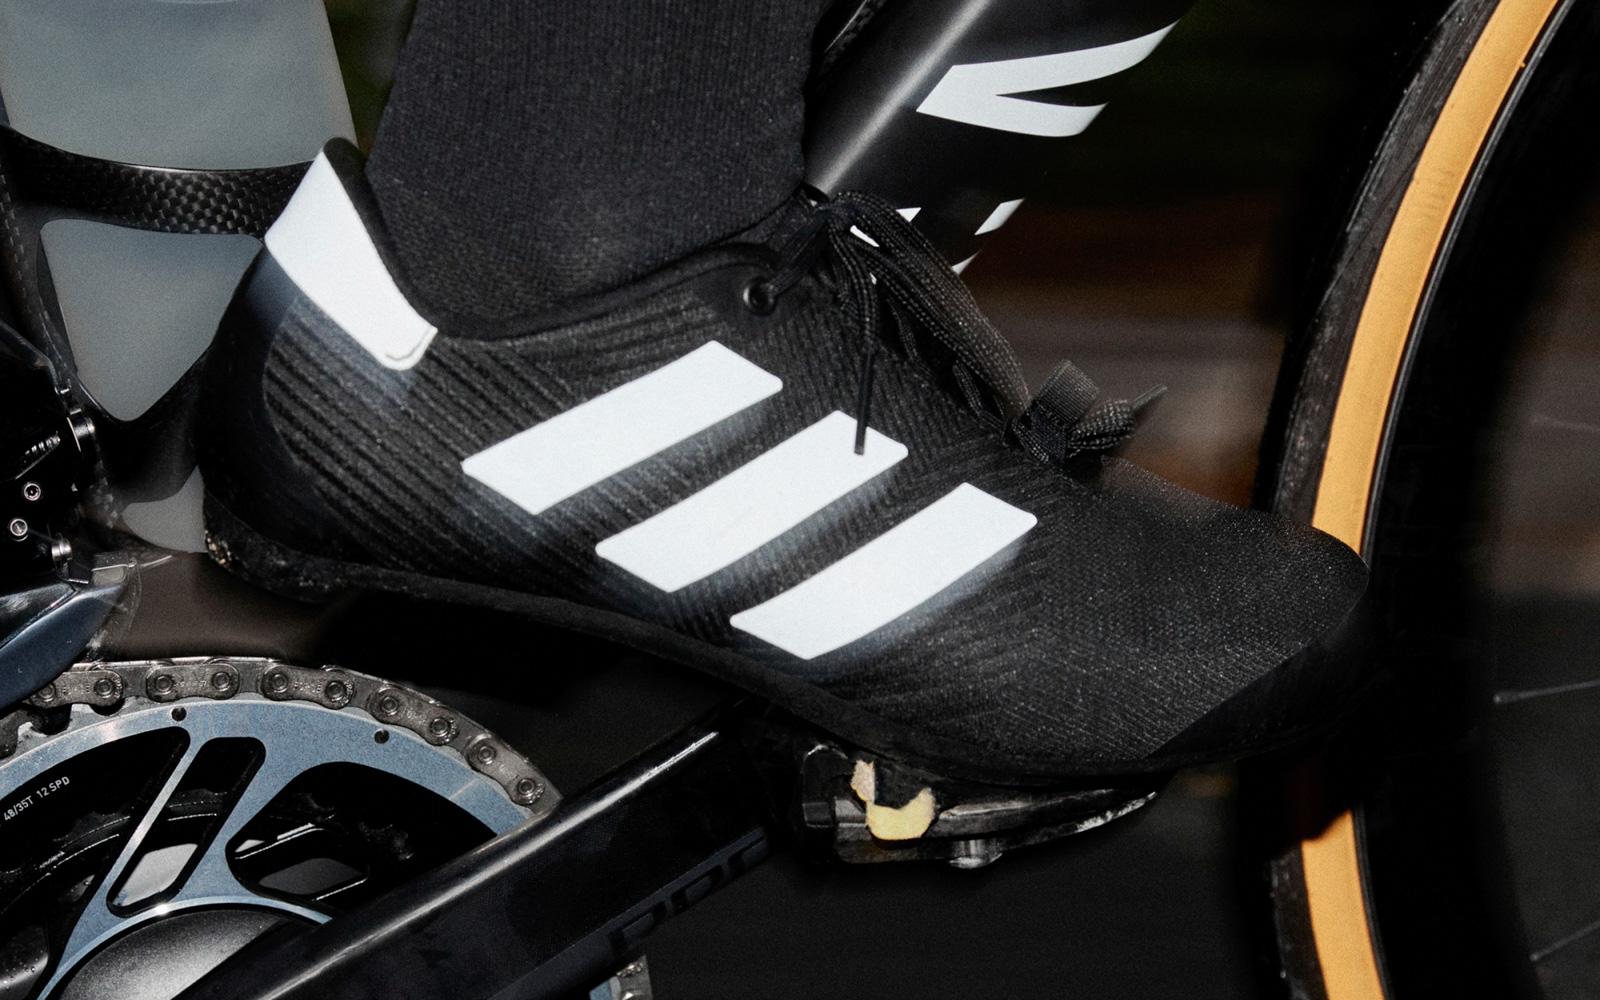 The_Road_Cycling_Shoes_Black_FW4457_HM1.jpg